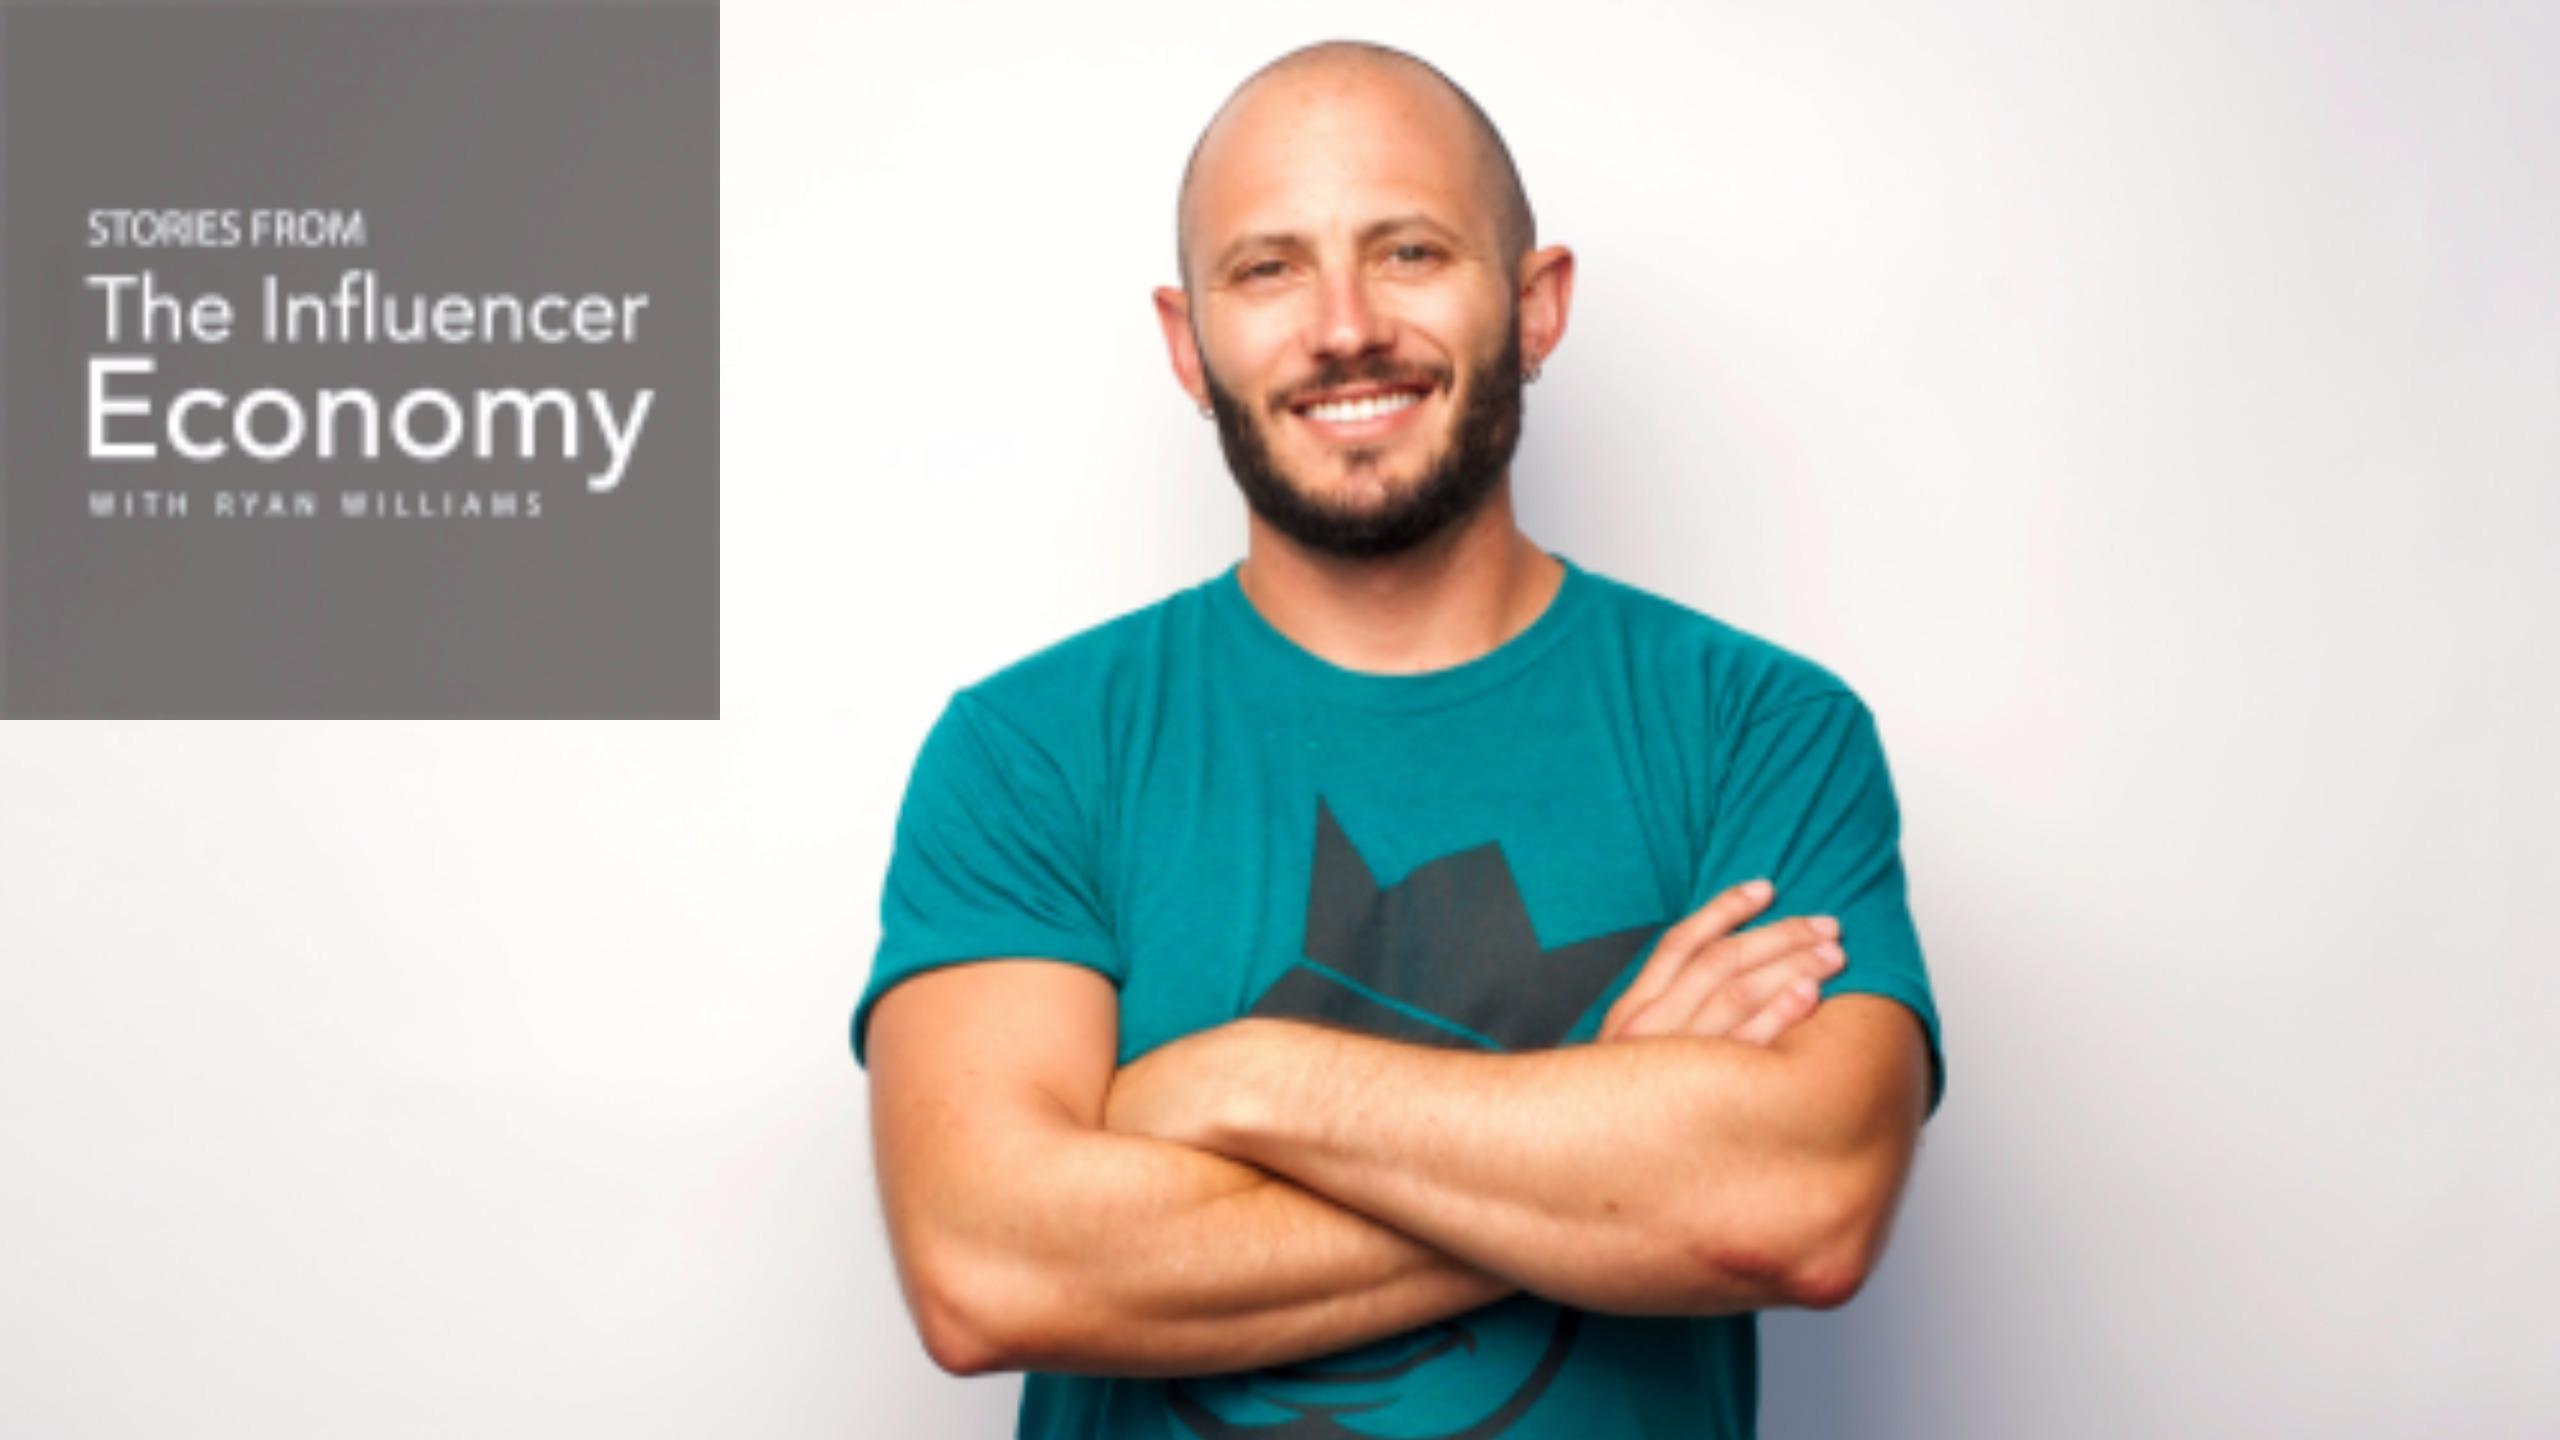 Noah Kagan and Ryan Williams on The Influencer Economy